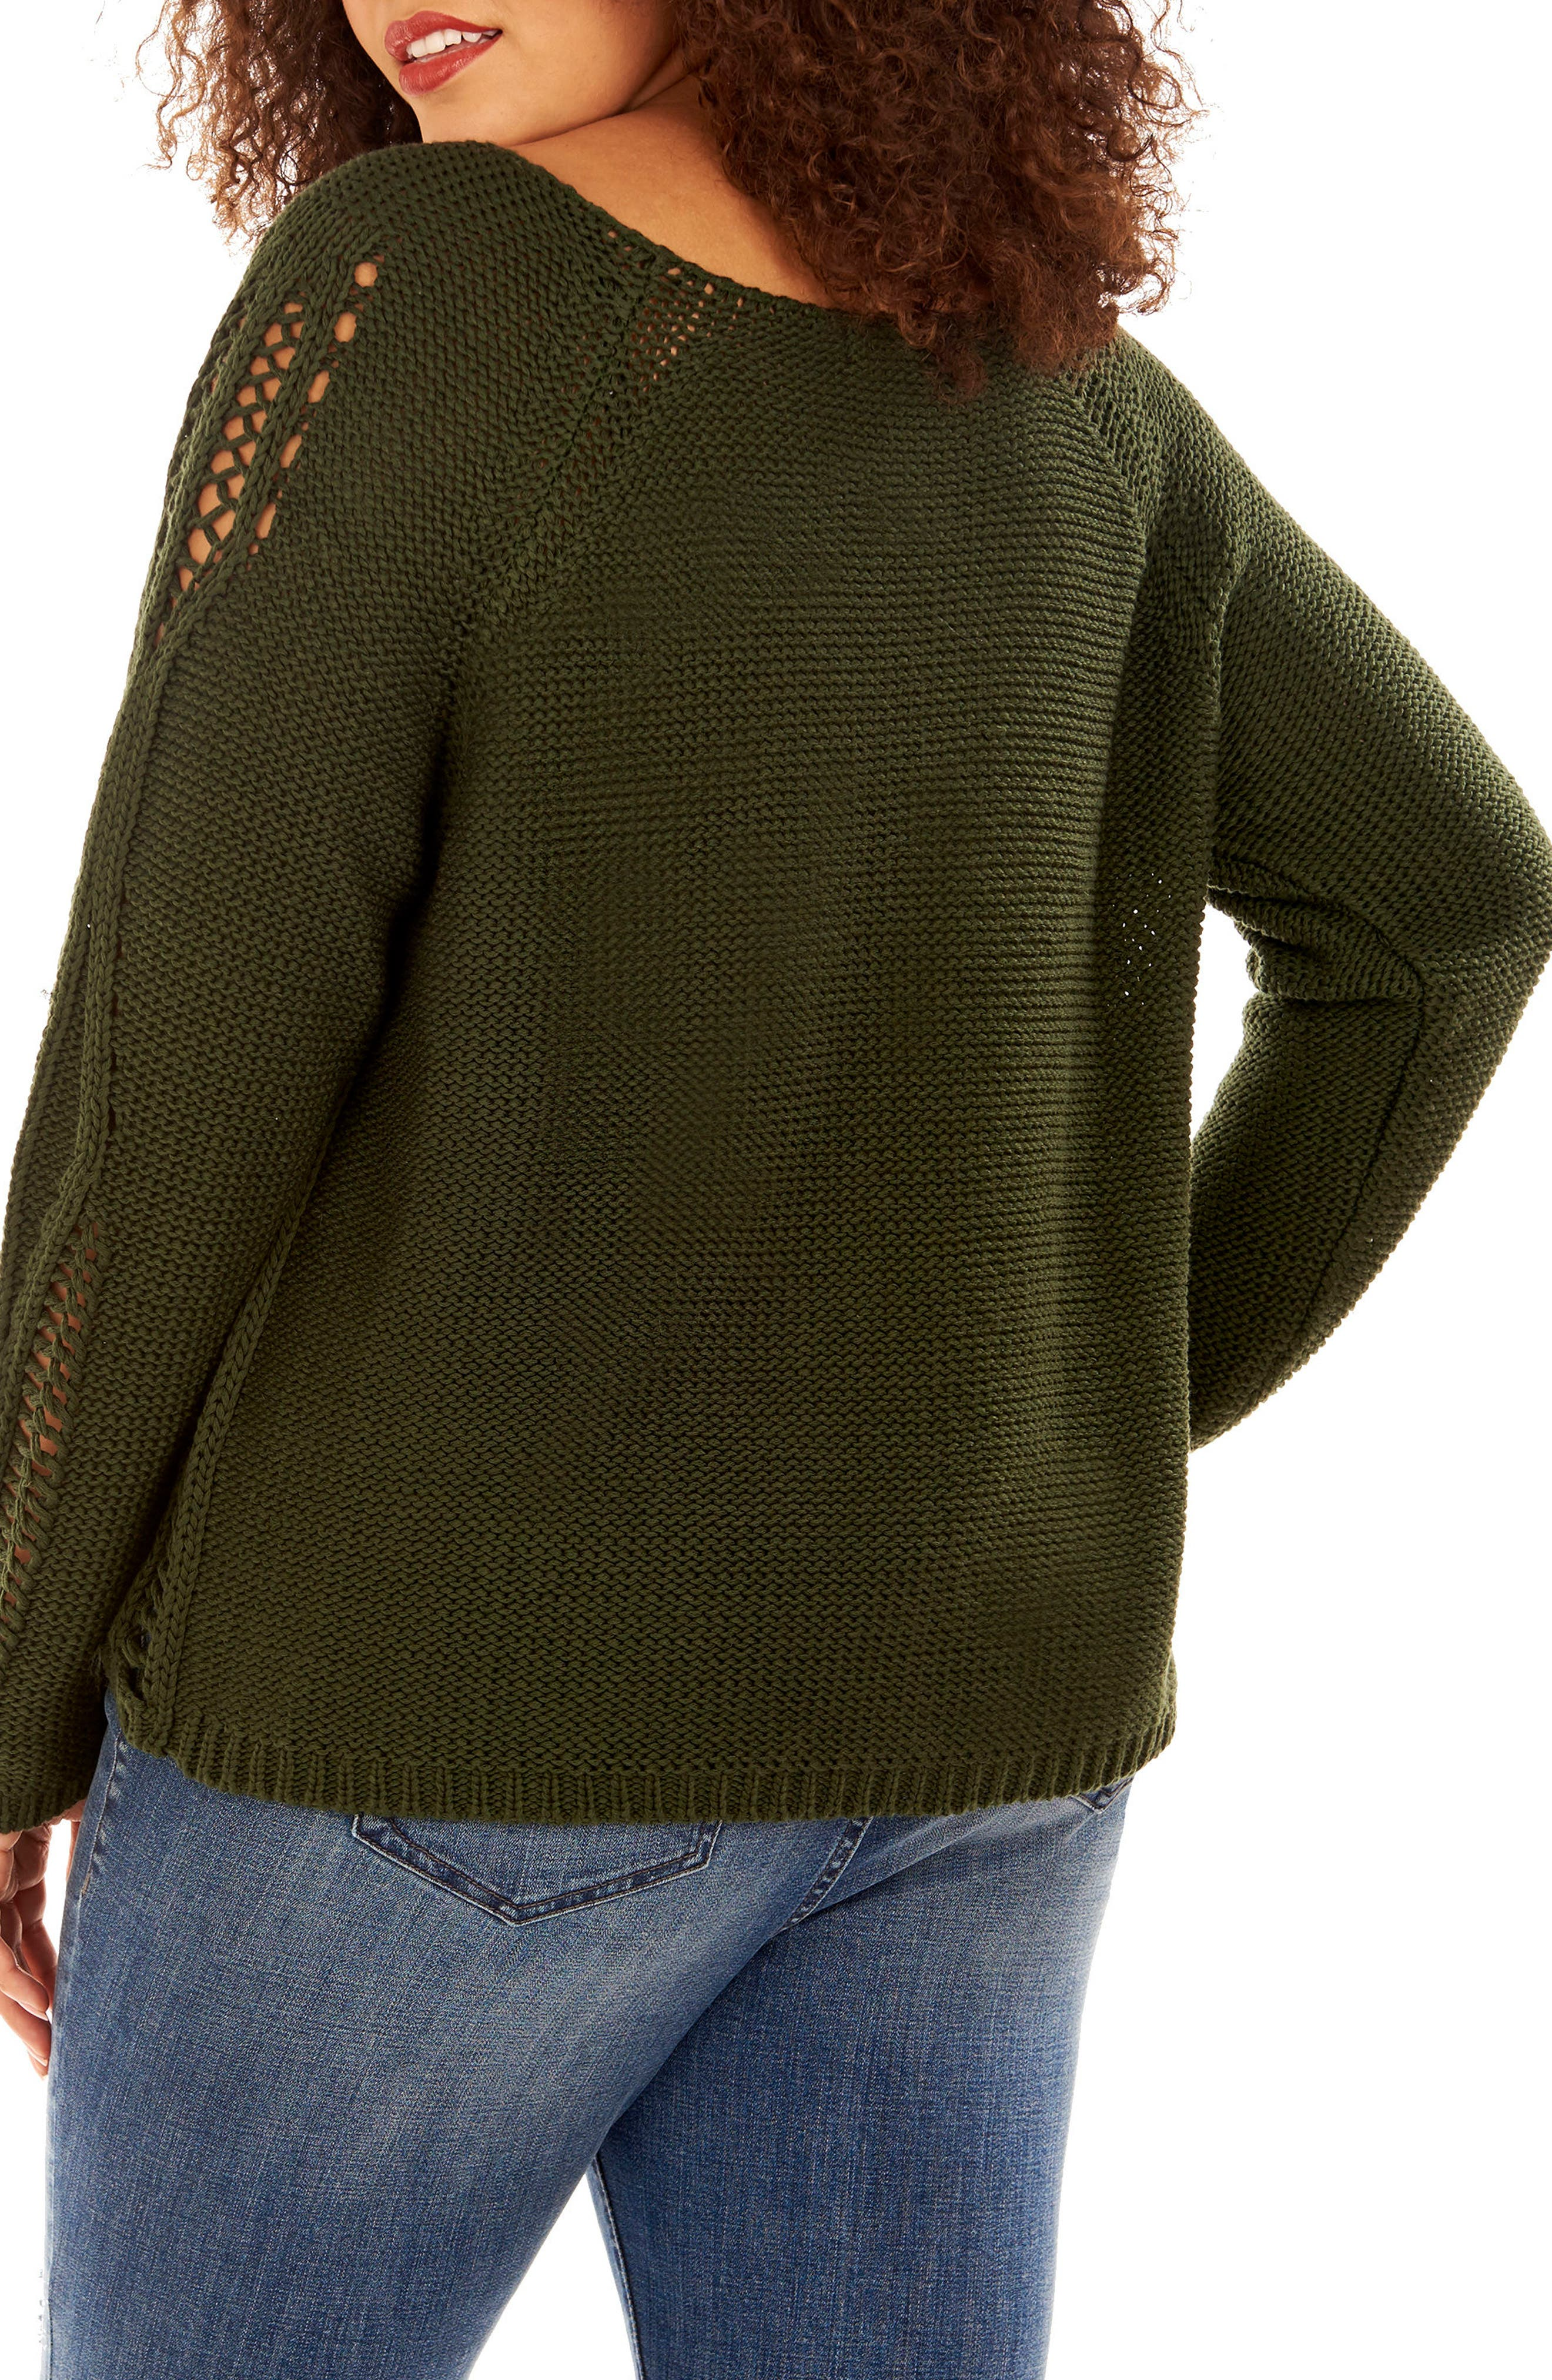 Alternate Image 2  - Rebel Wilson x Angels Open Stitch Sweater (Plus Size)